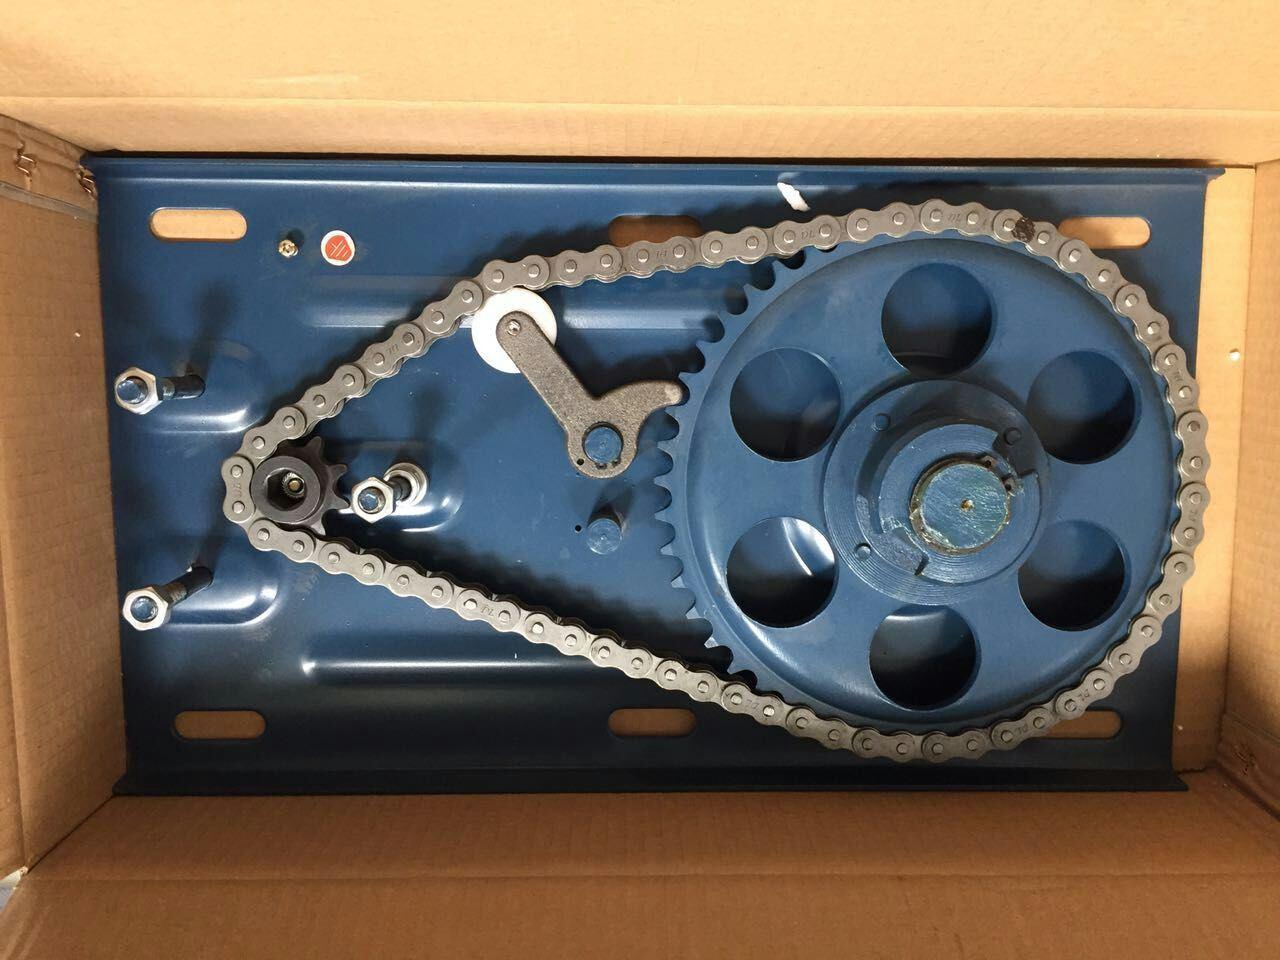 AC Universal Electrical Roller Shutter Motor